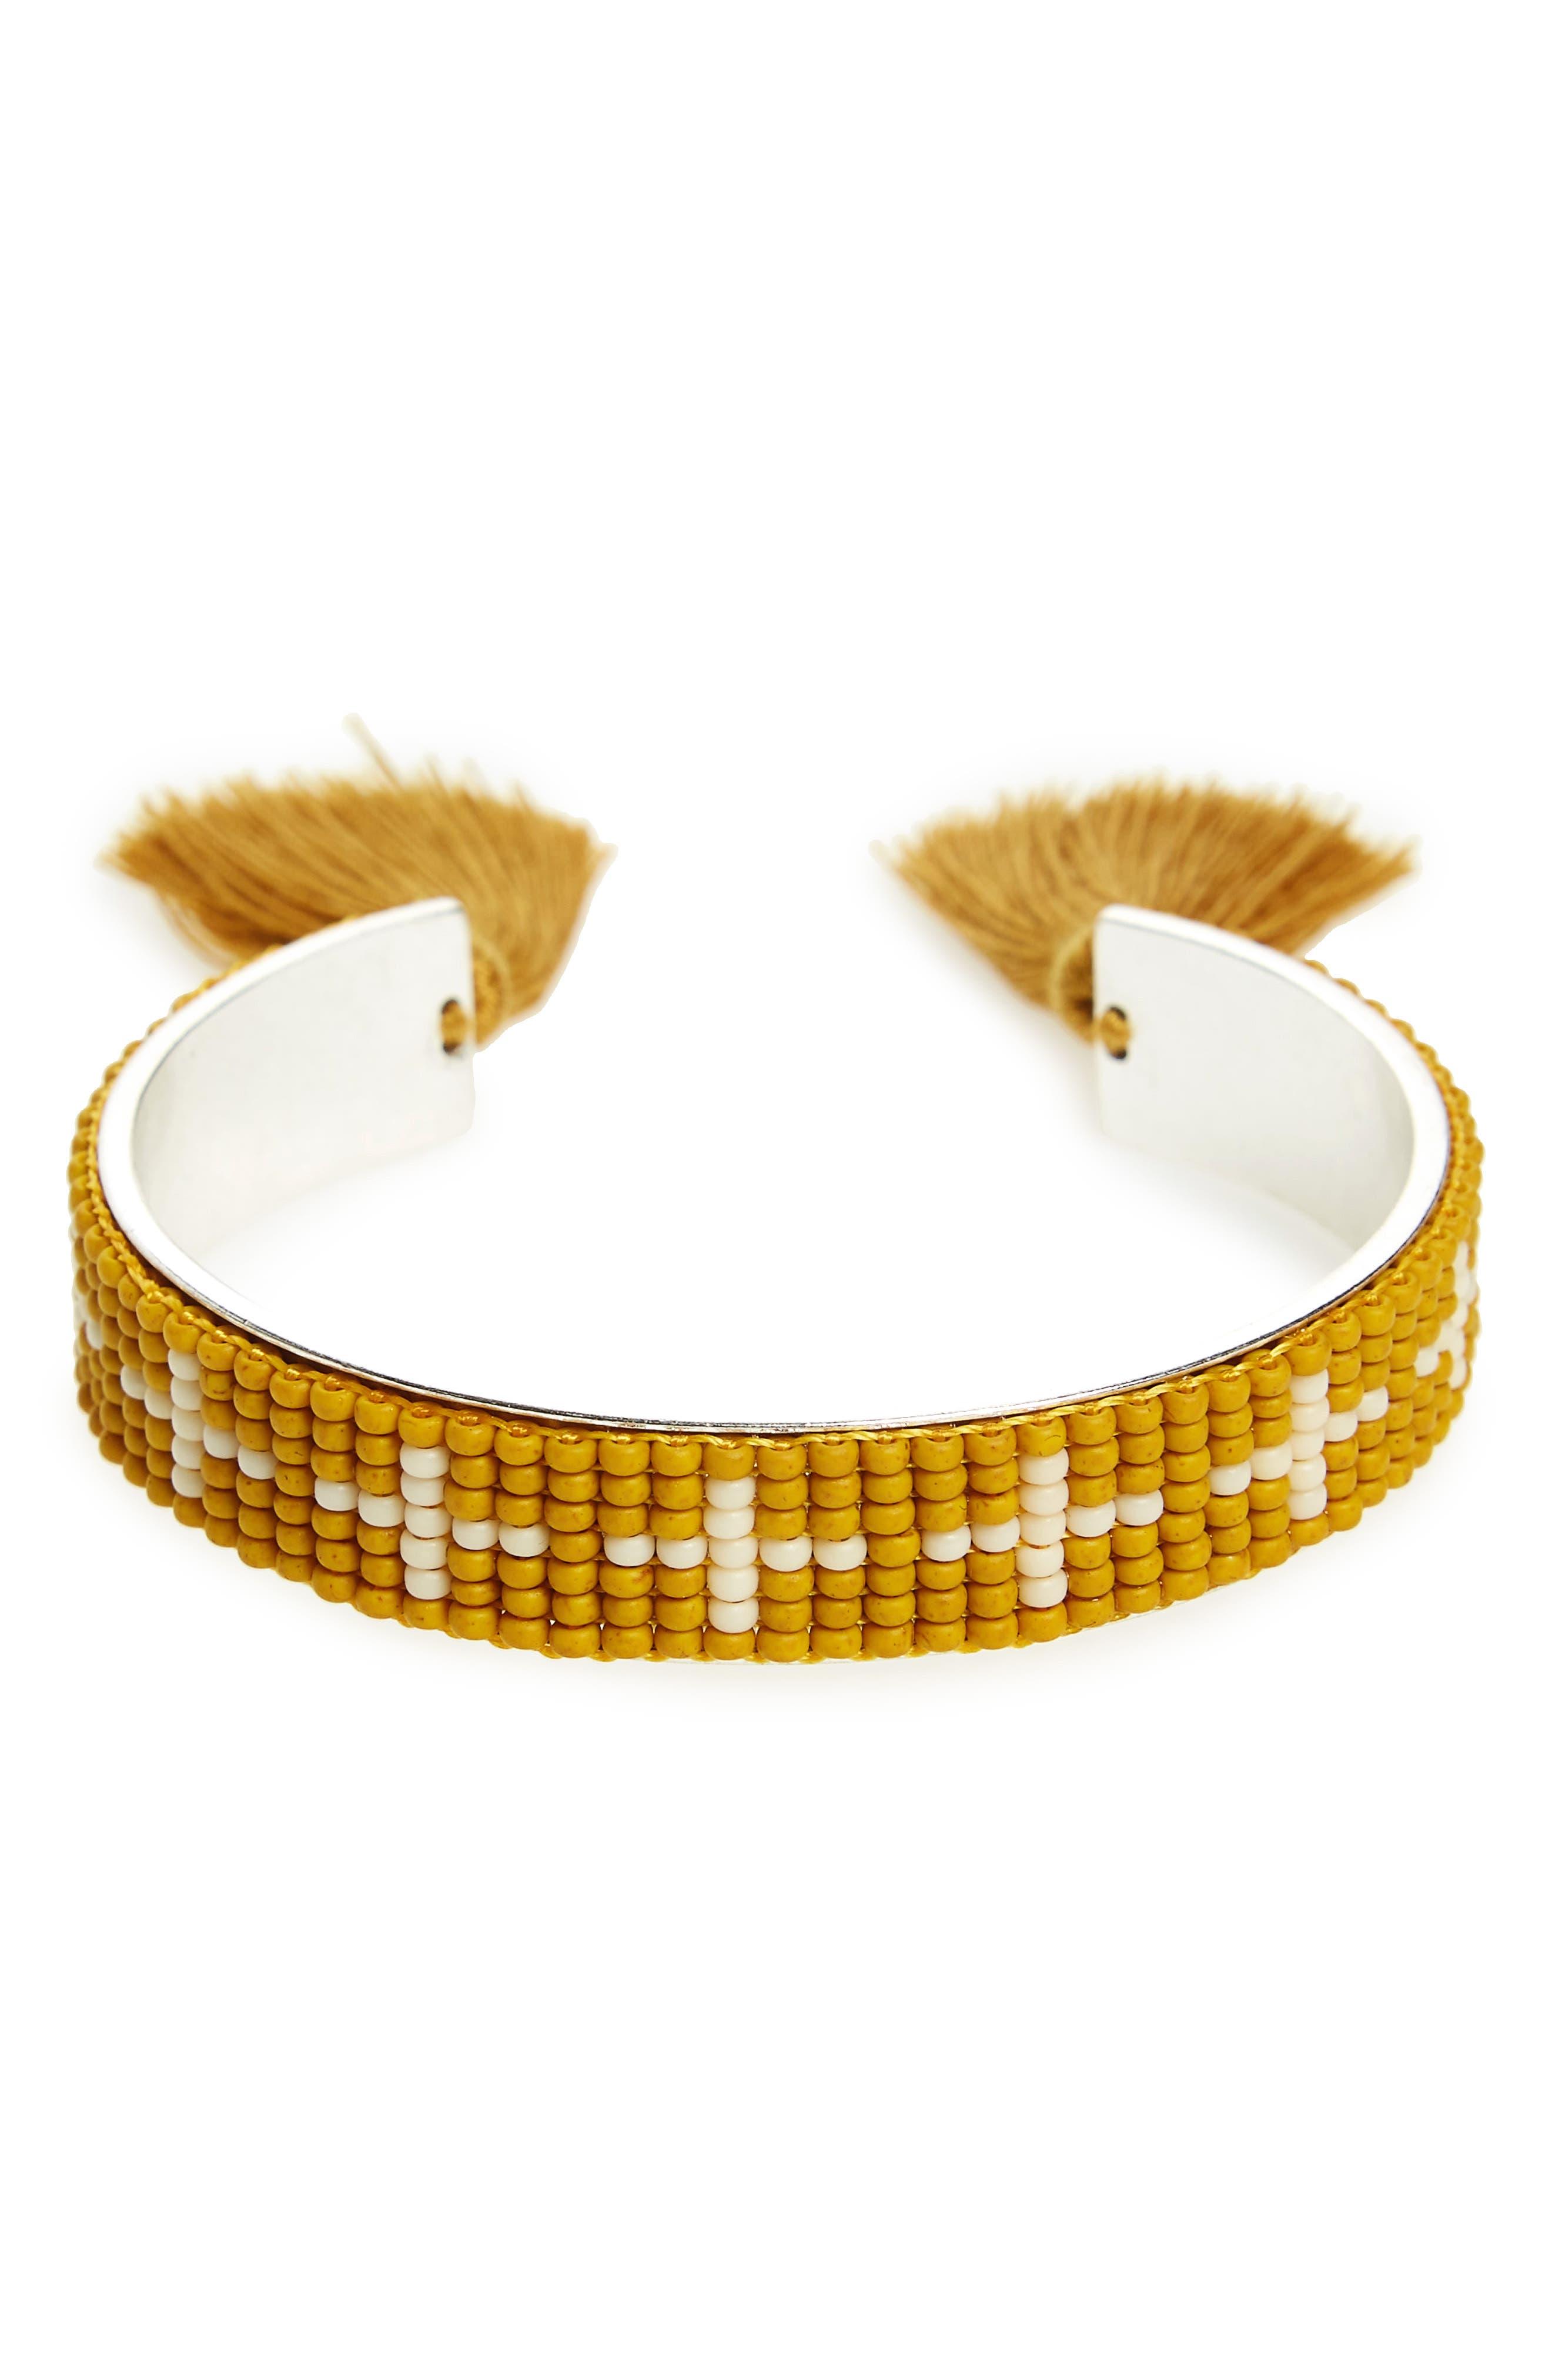 Madewell Beaded Cuff Bracelet